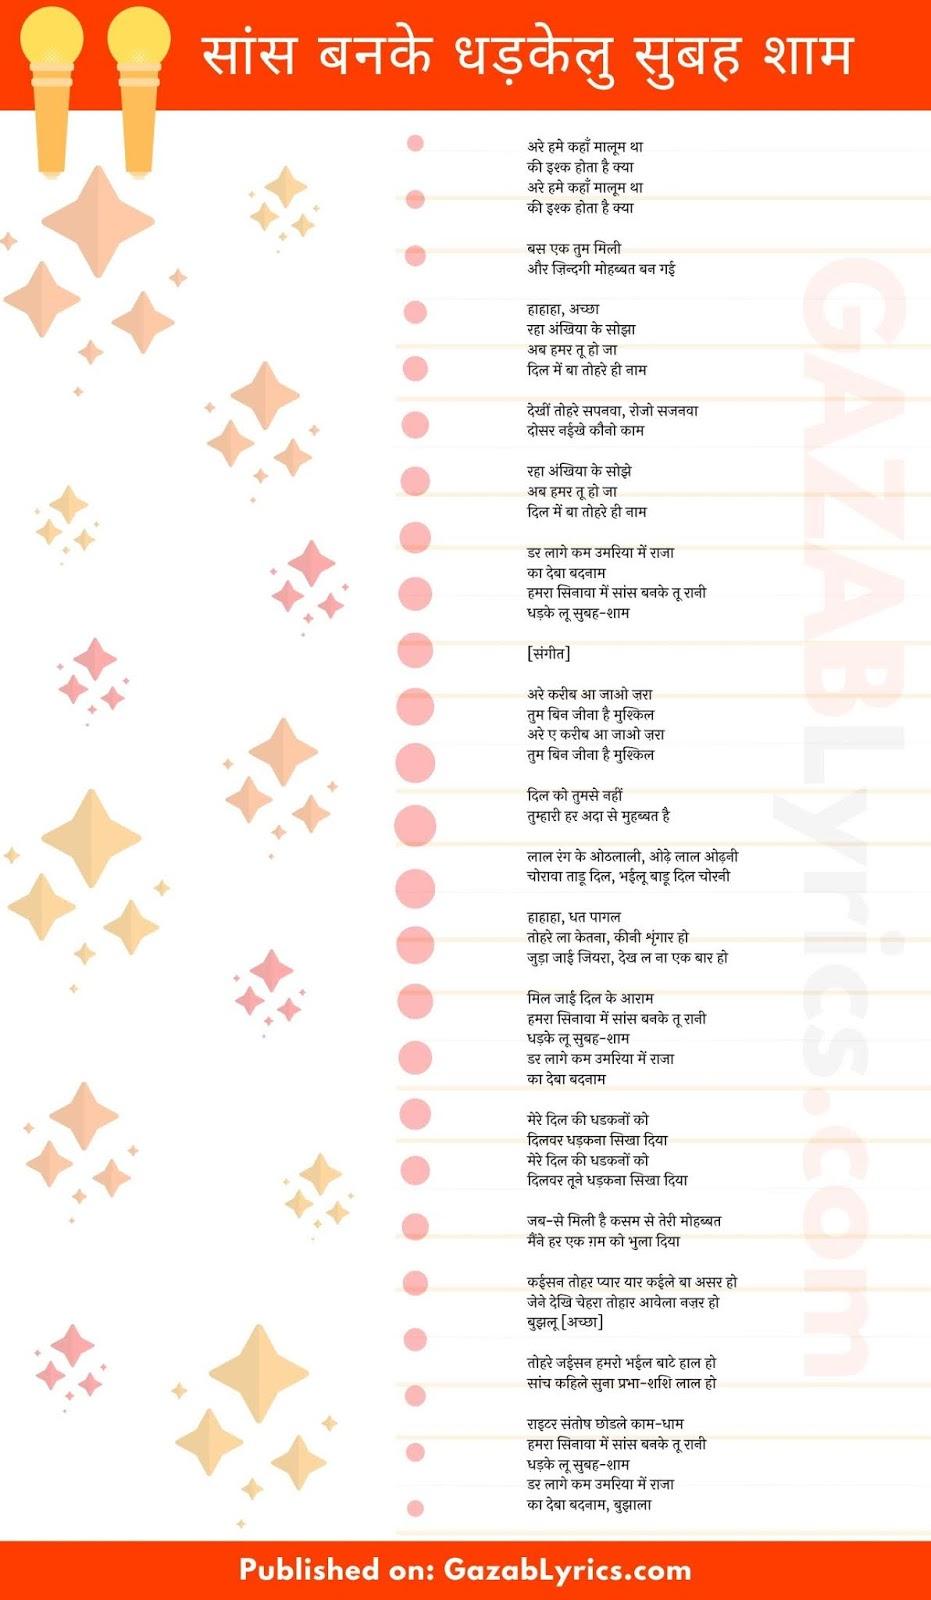 Sas Banke Dharkelu Subah Sham song lyrics image